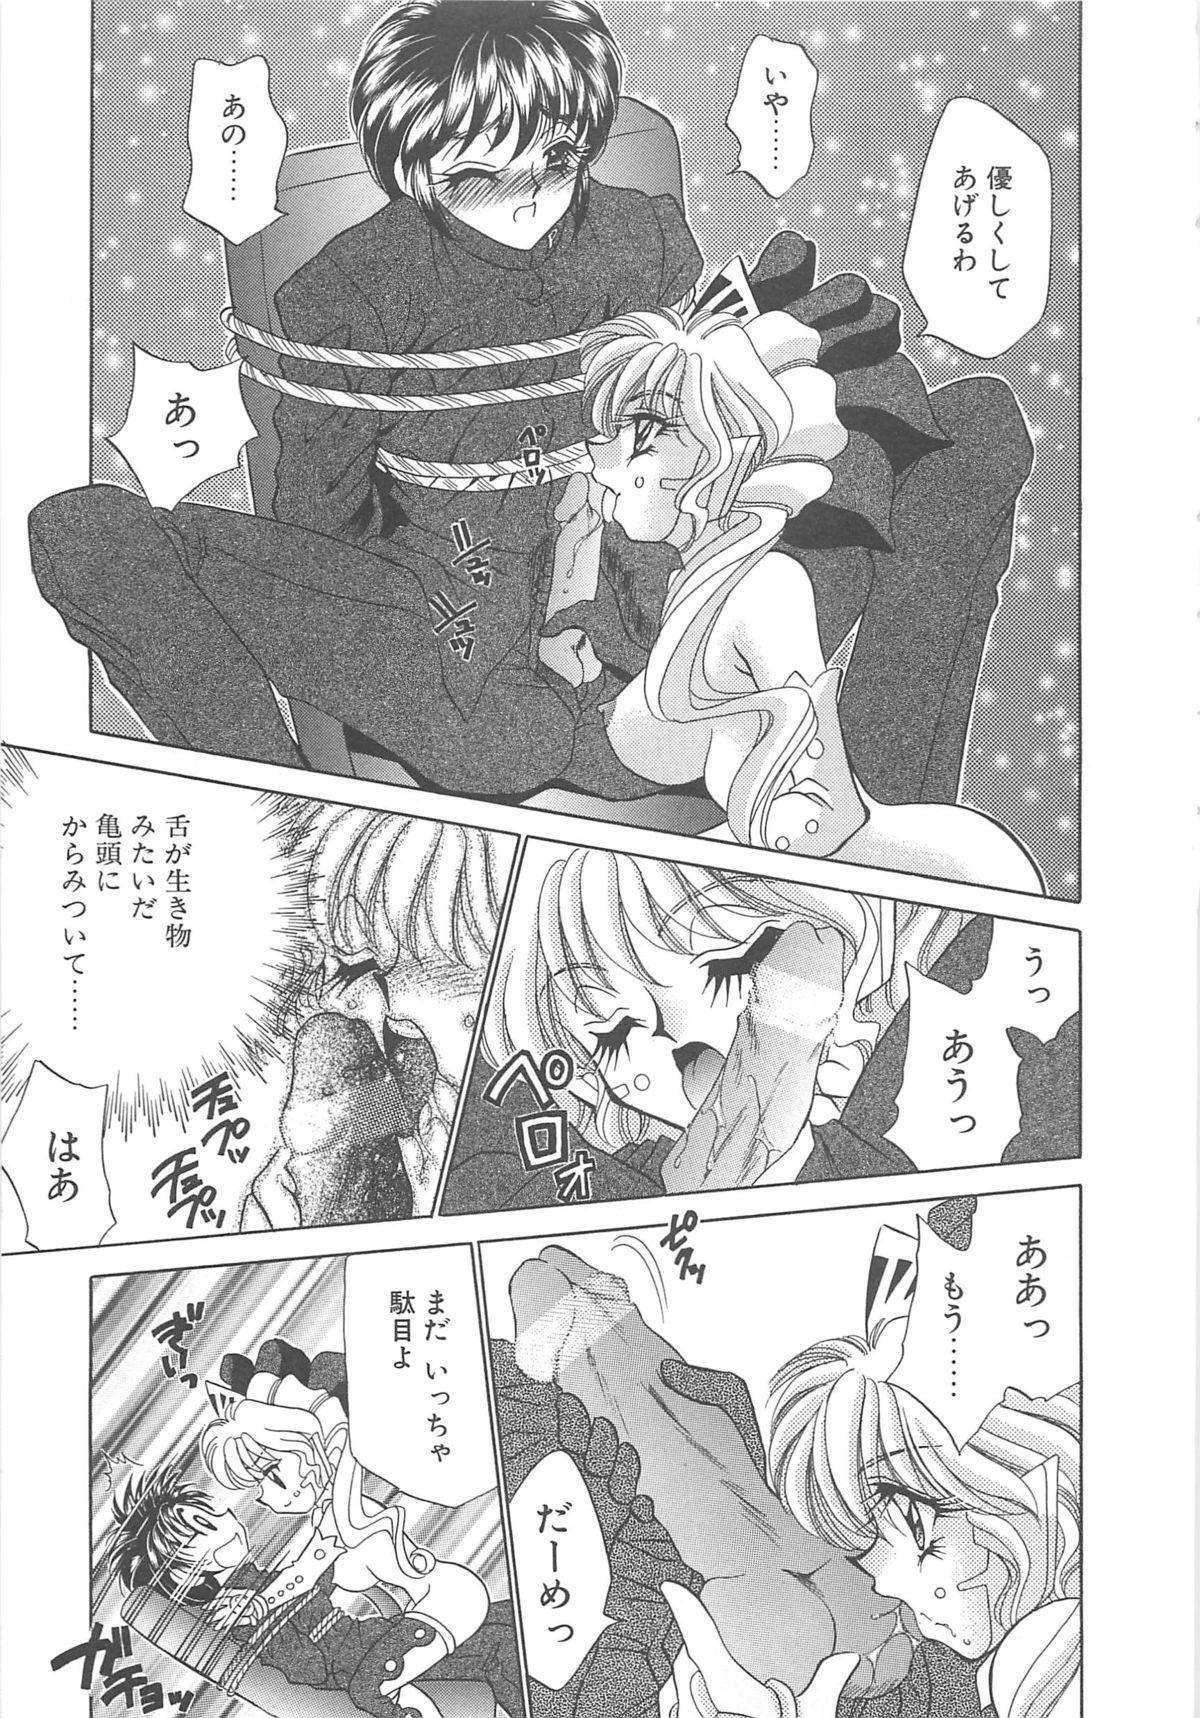 Kigurumi Sentai Quiltian 177